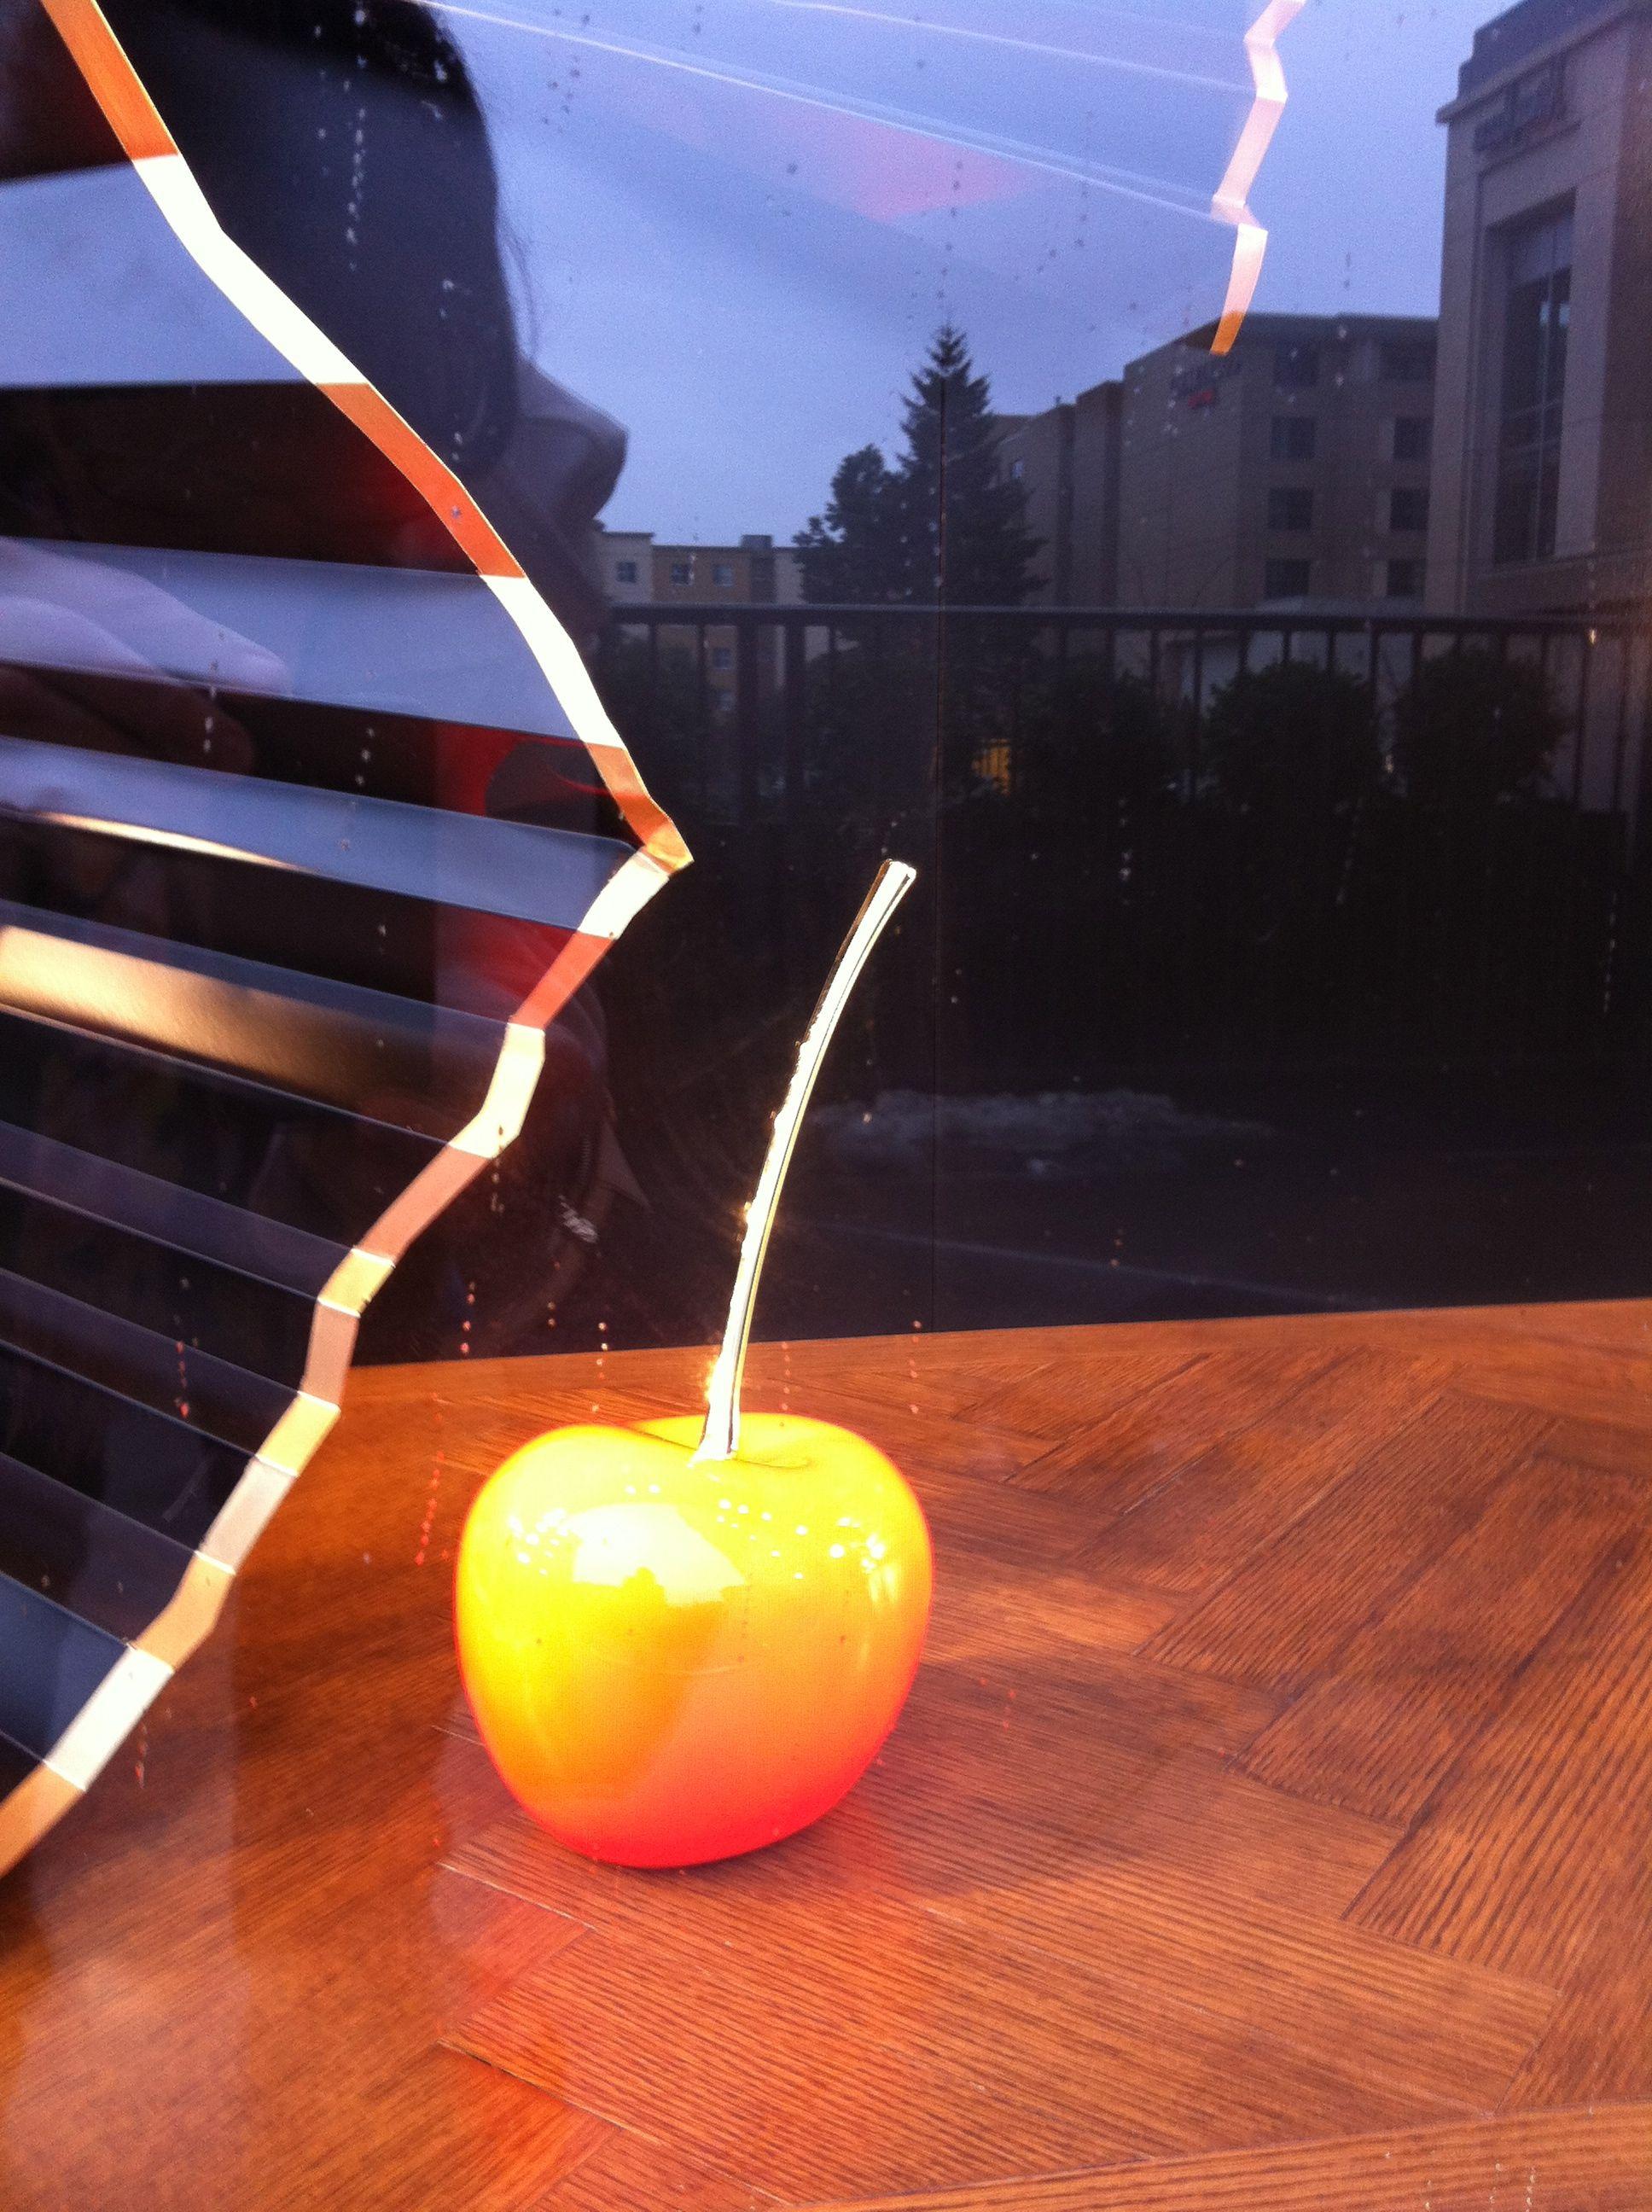 Glass Cherry in L. Vuitton window. Bellevue WA